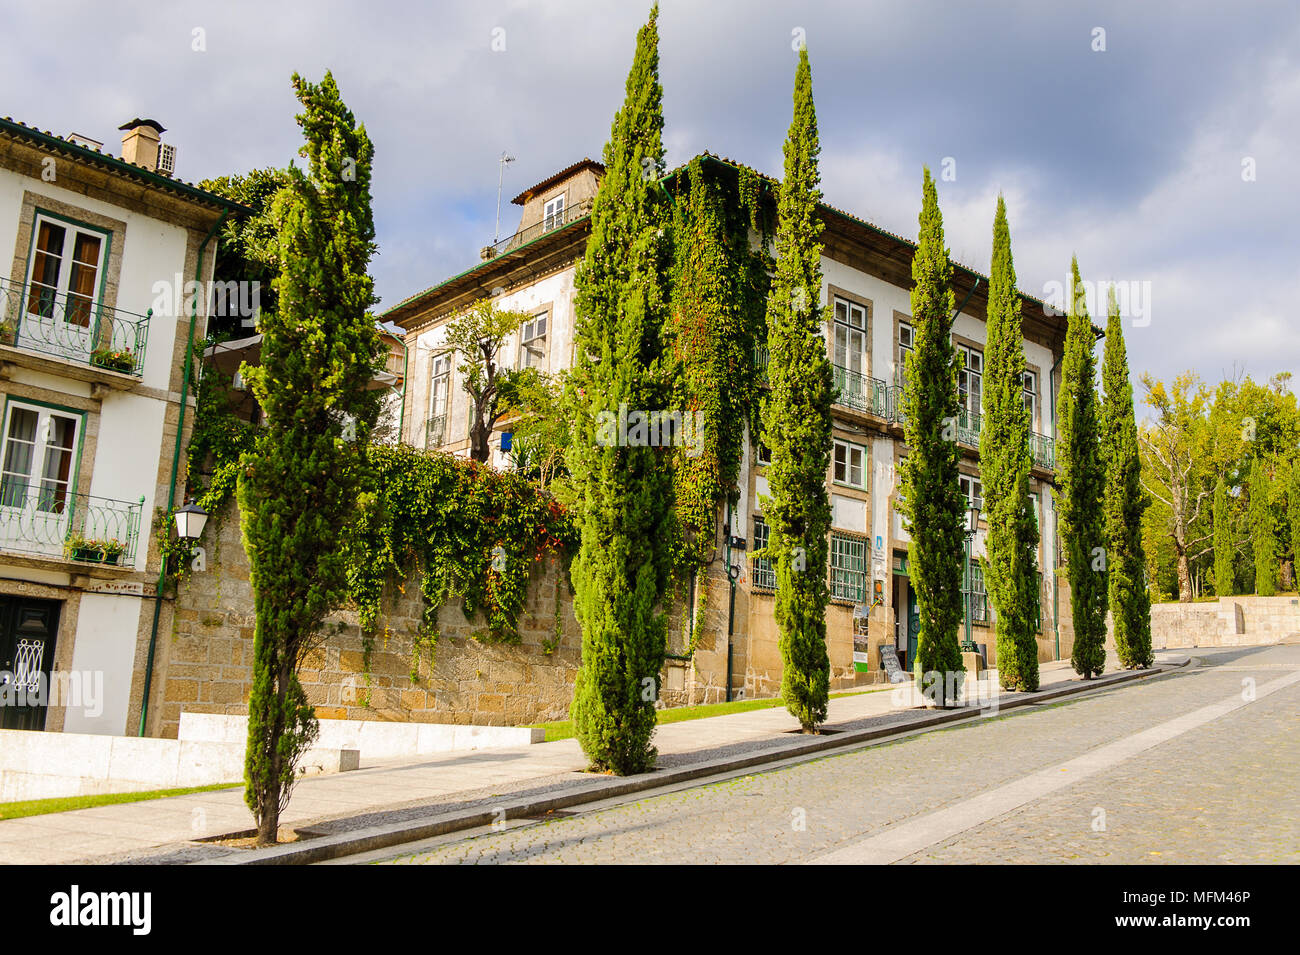 La arquitectura del centro histórico de Guimaraes db584ff7c5273